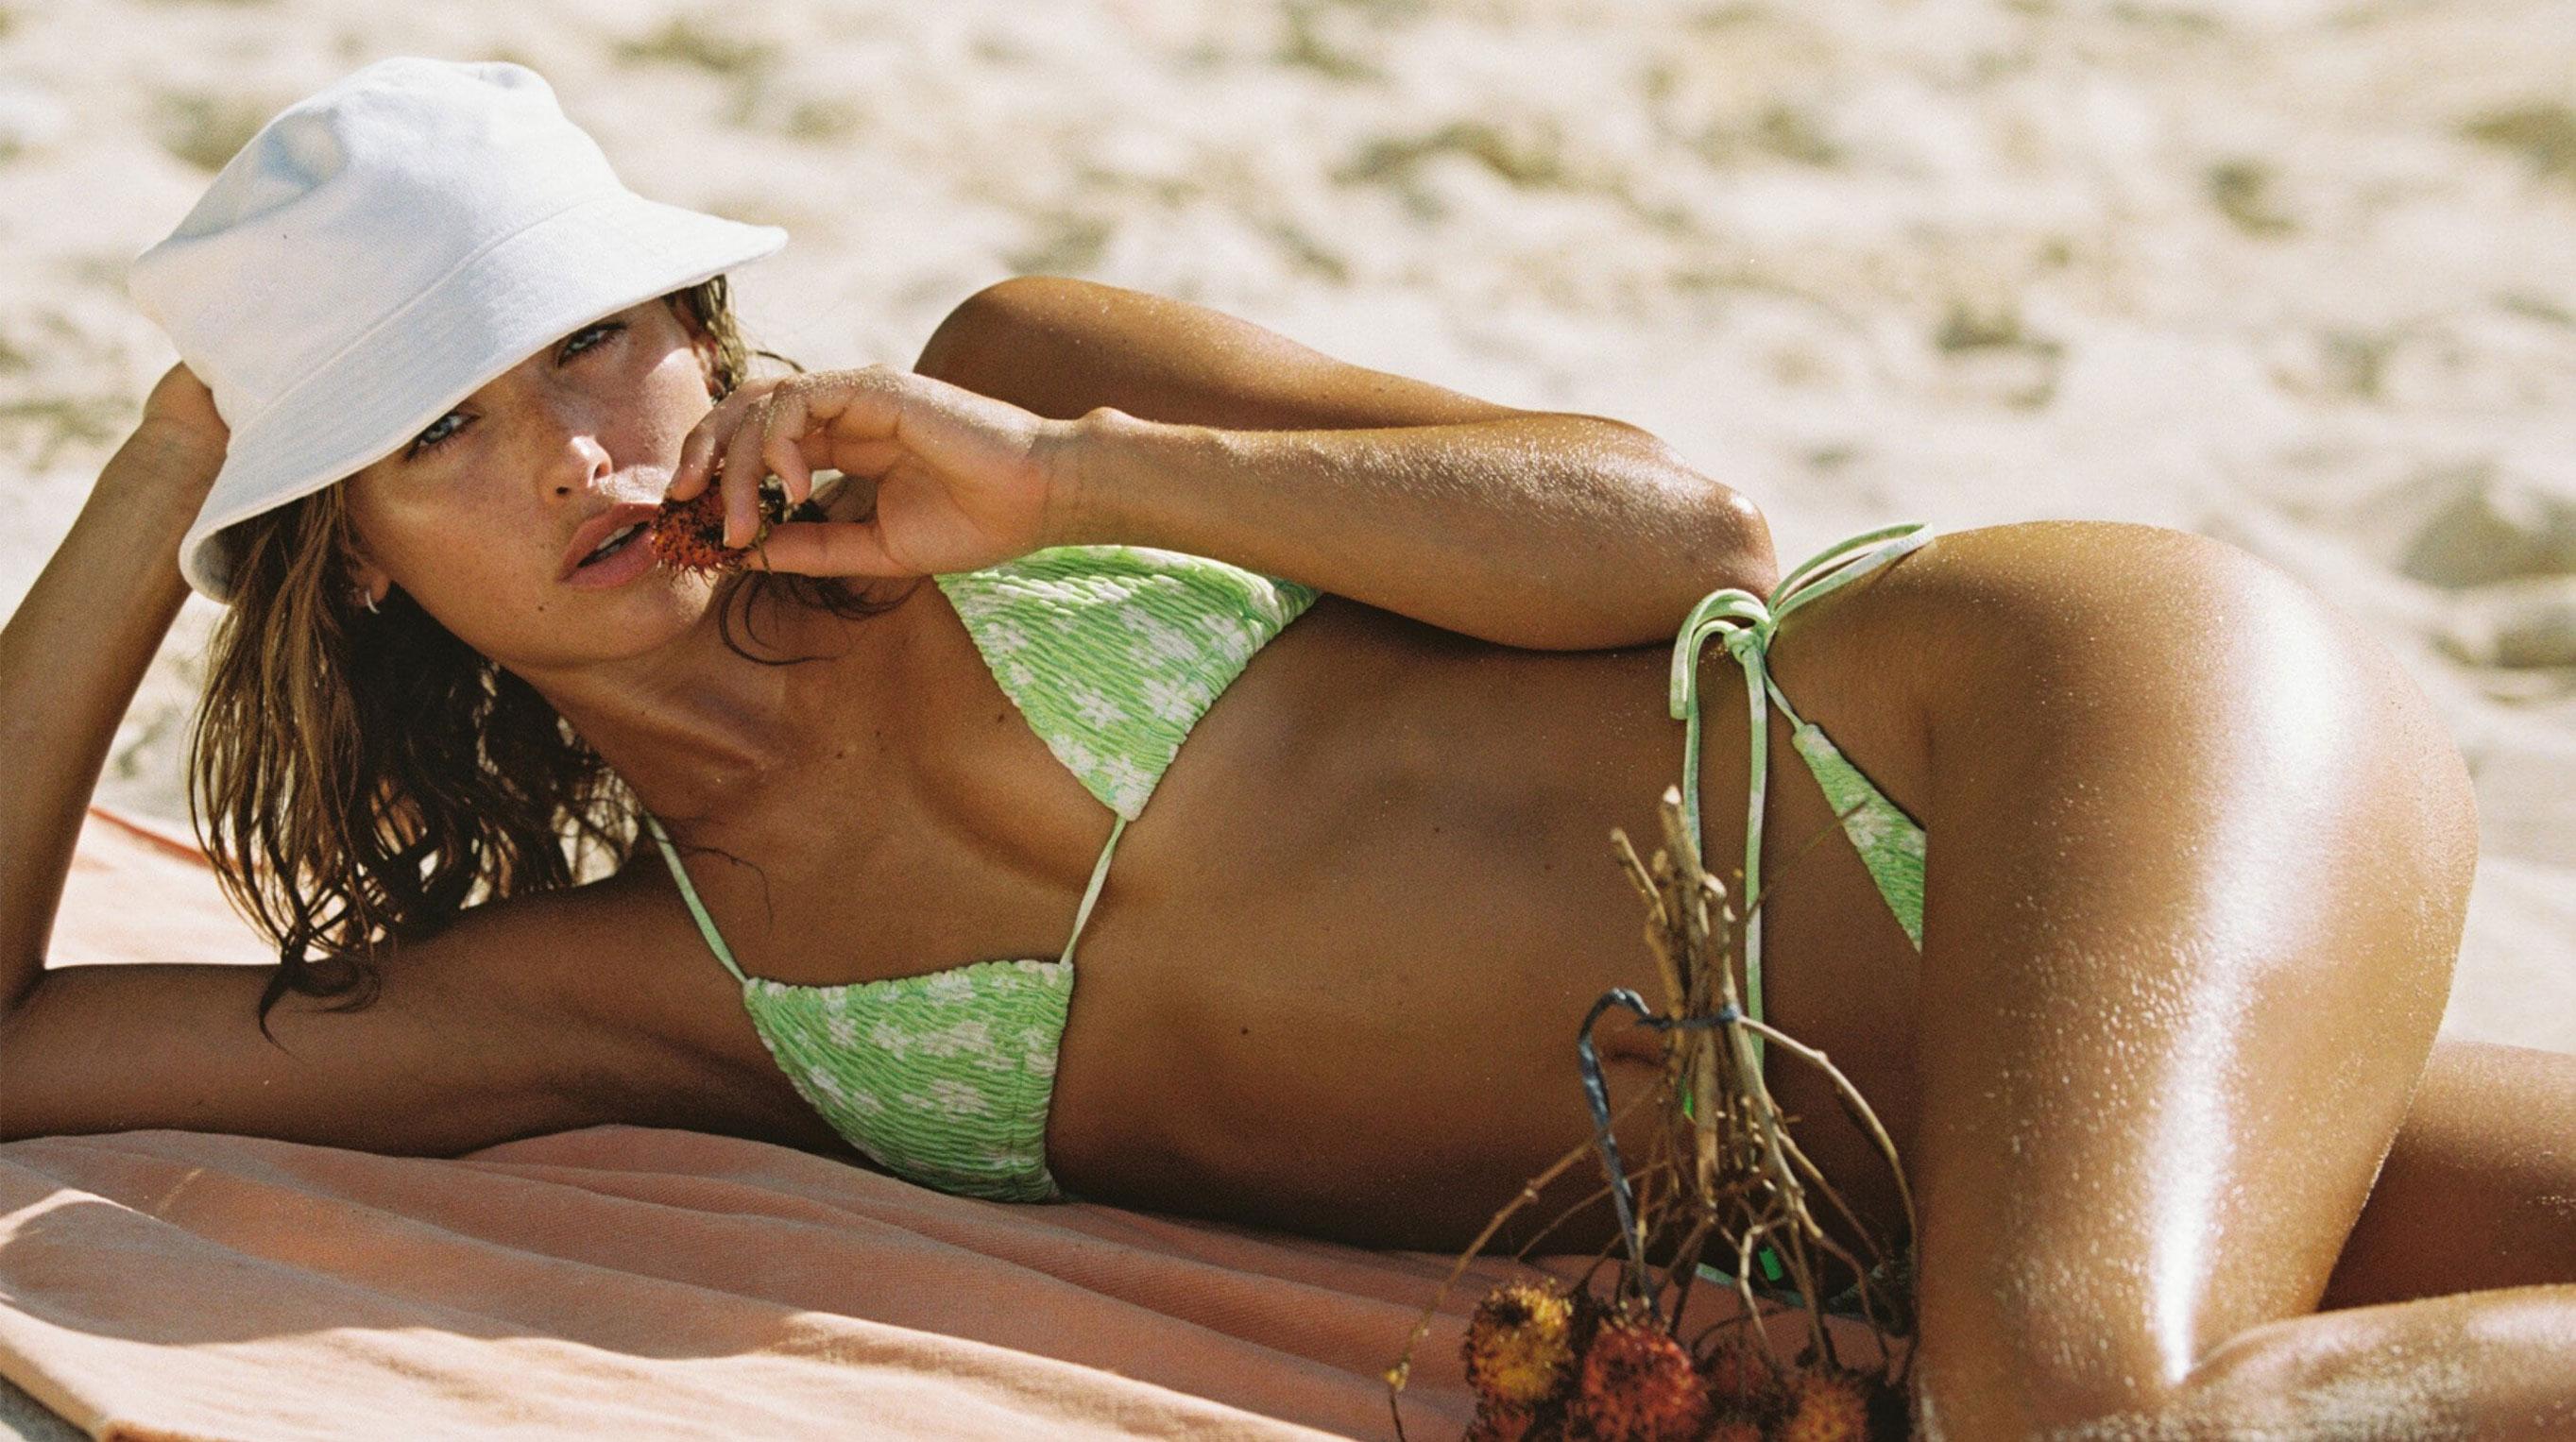 Каролина Санчес в купальниках модного бренда Triangl Swimwear / фото 12